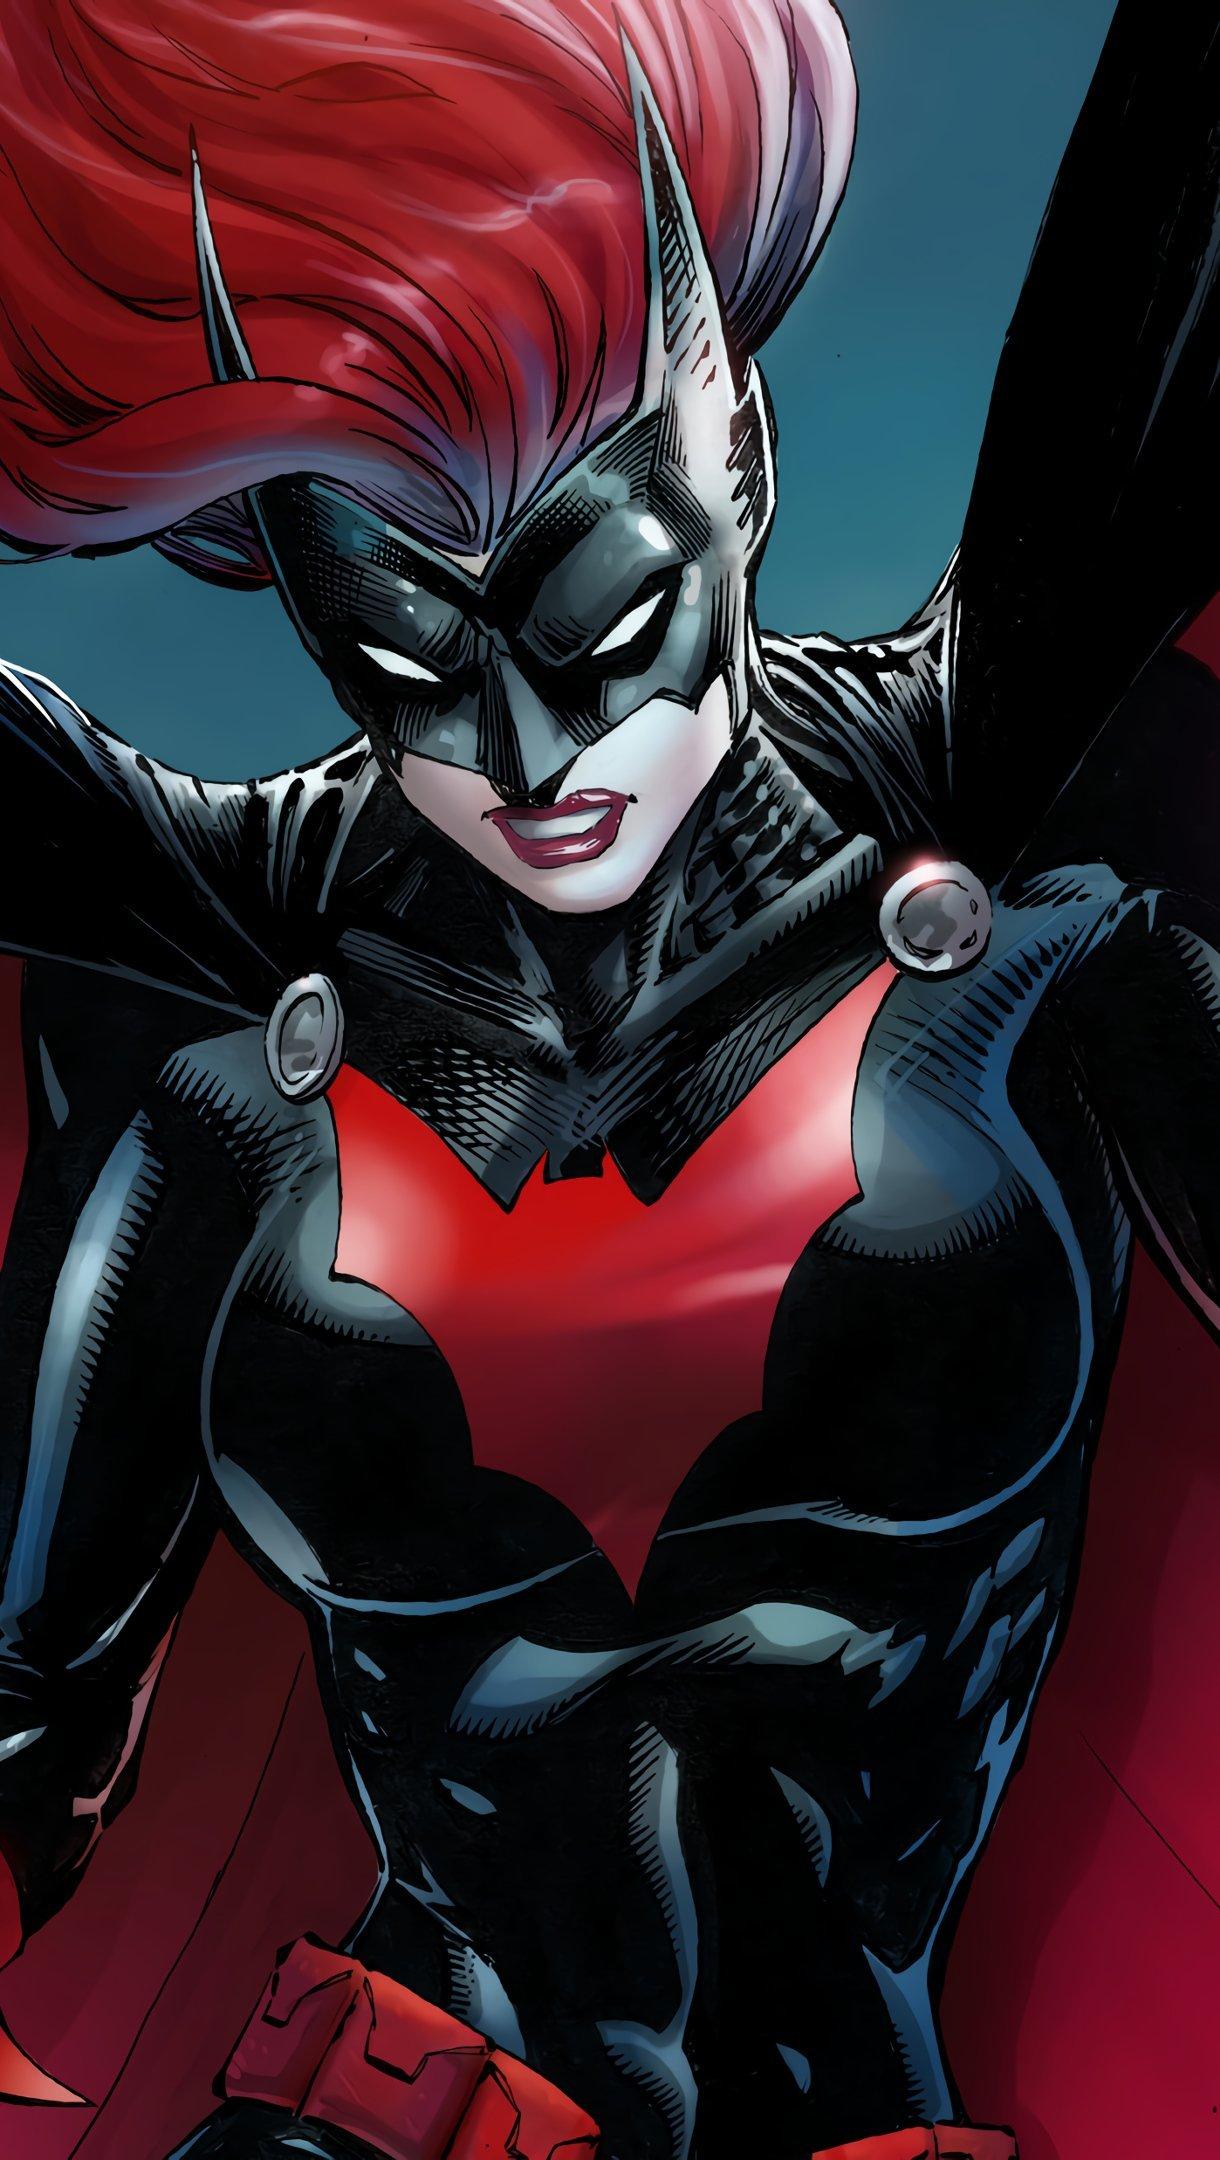 Fondos de pantalla Batwoman Fanart Vertical